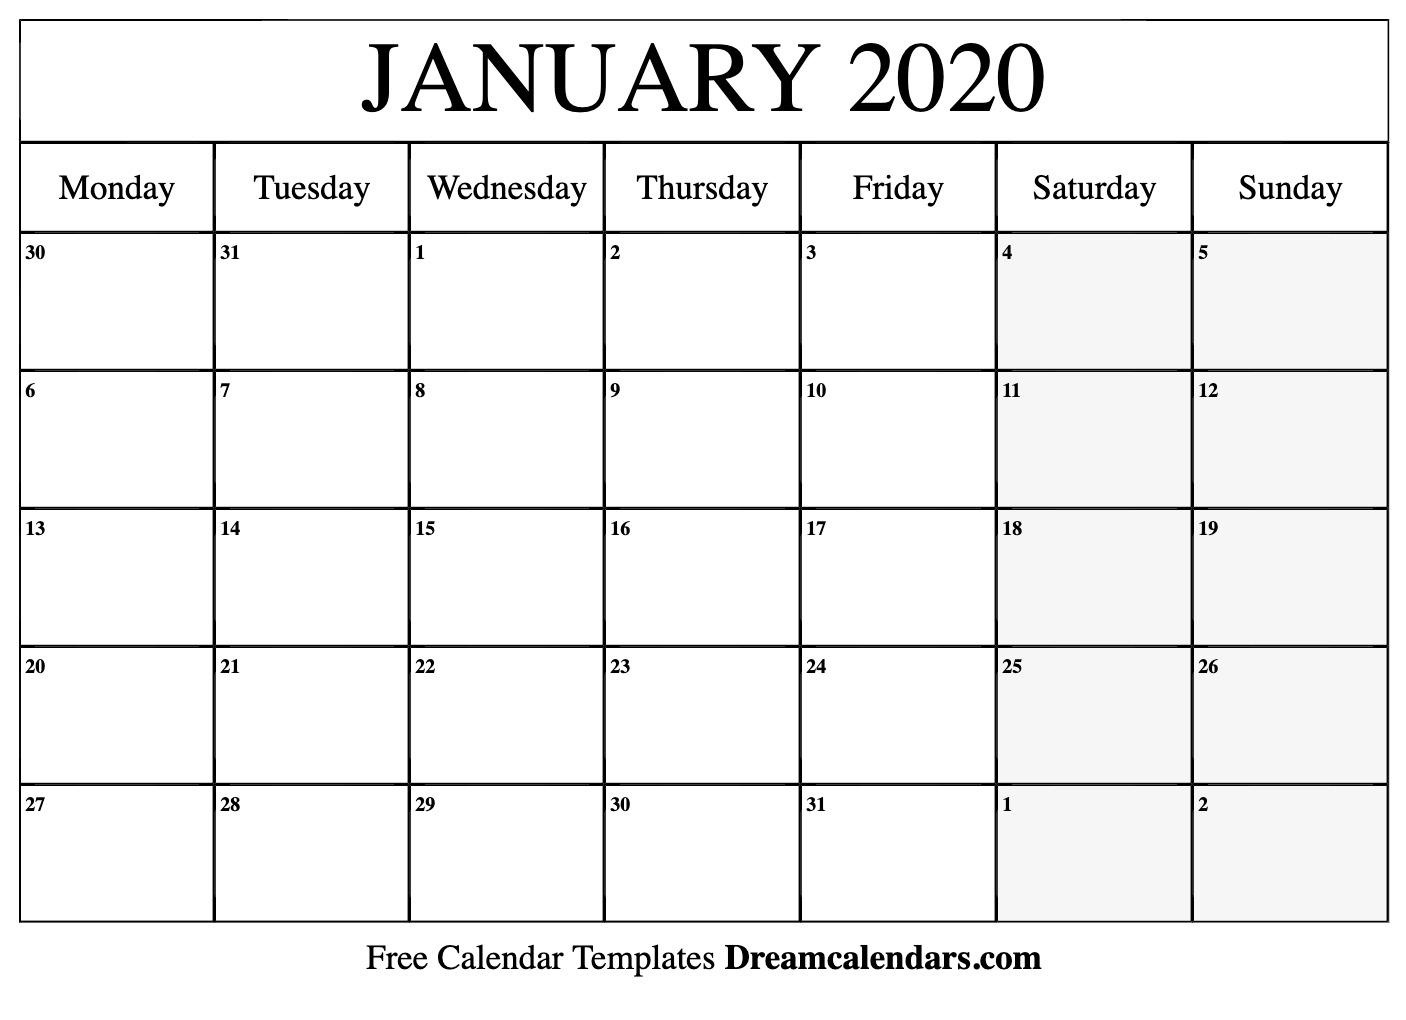 Printable January 2020 Calendar  Kofi ❤️ Where Creators pertaining to January 2020 Calendar Starting Monday